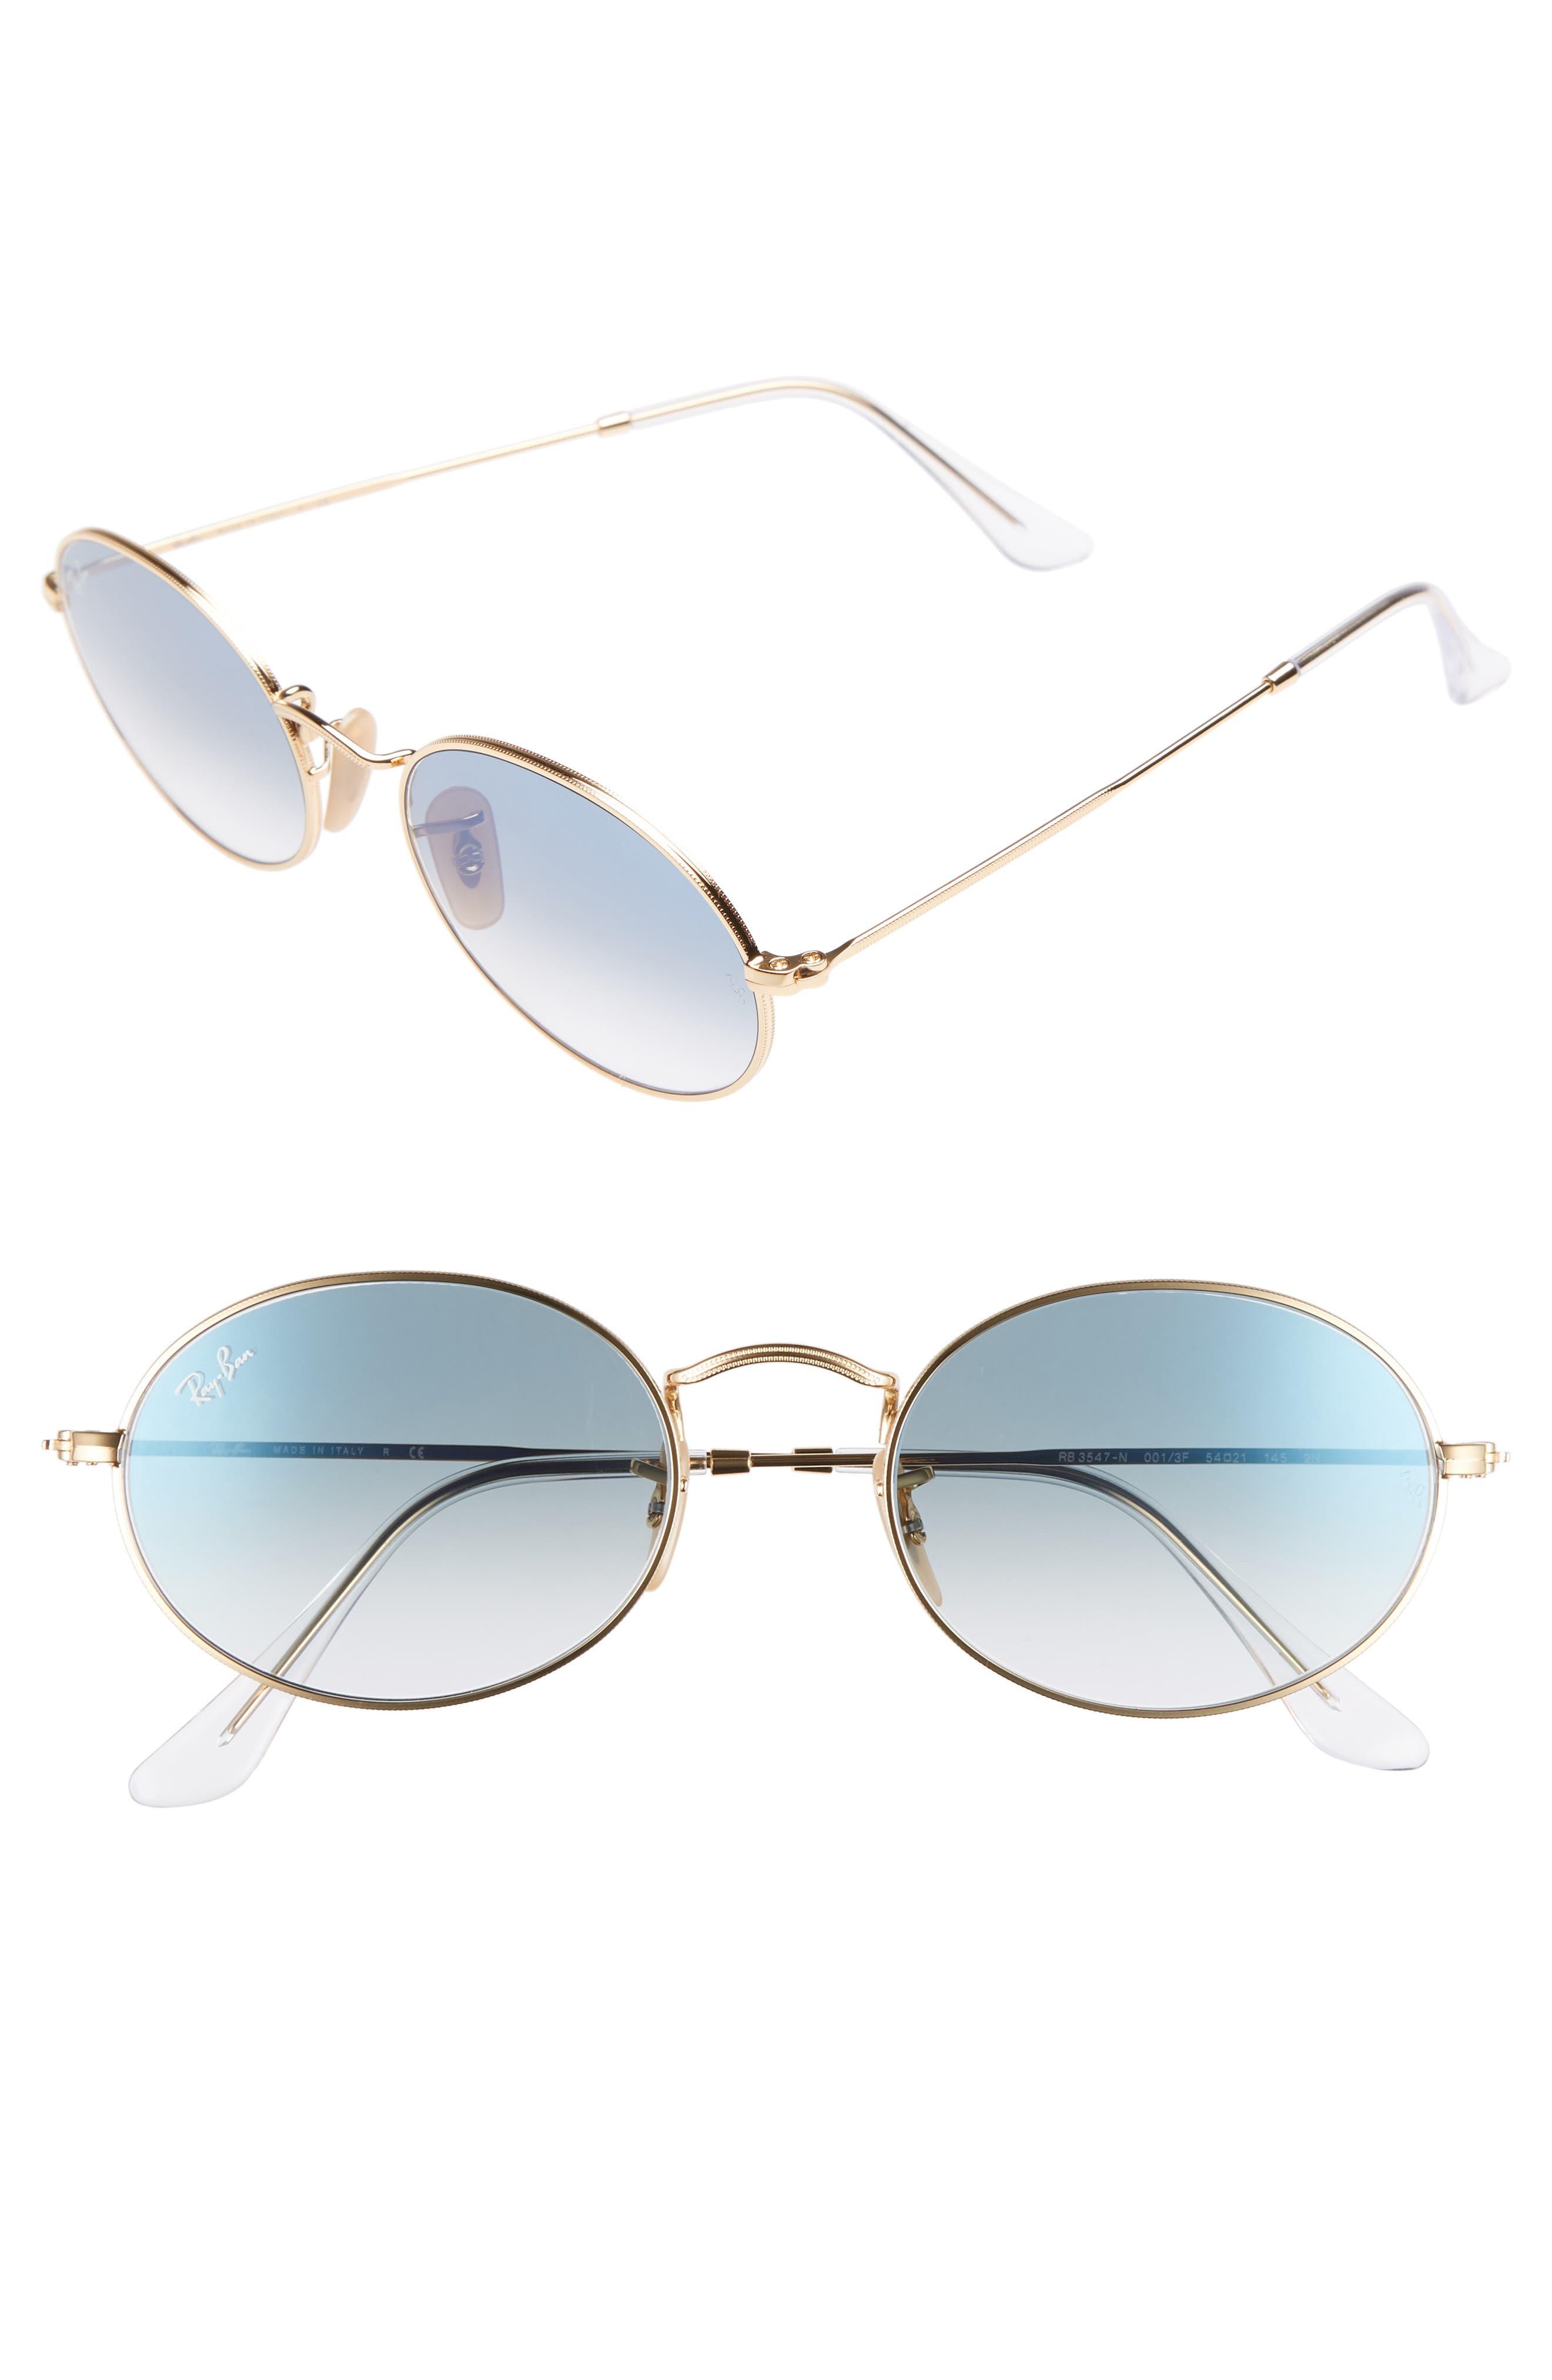 54mm Oval Sunglasses,                             Main thumbnail 1, color,                             Gold